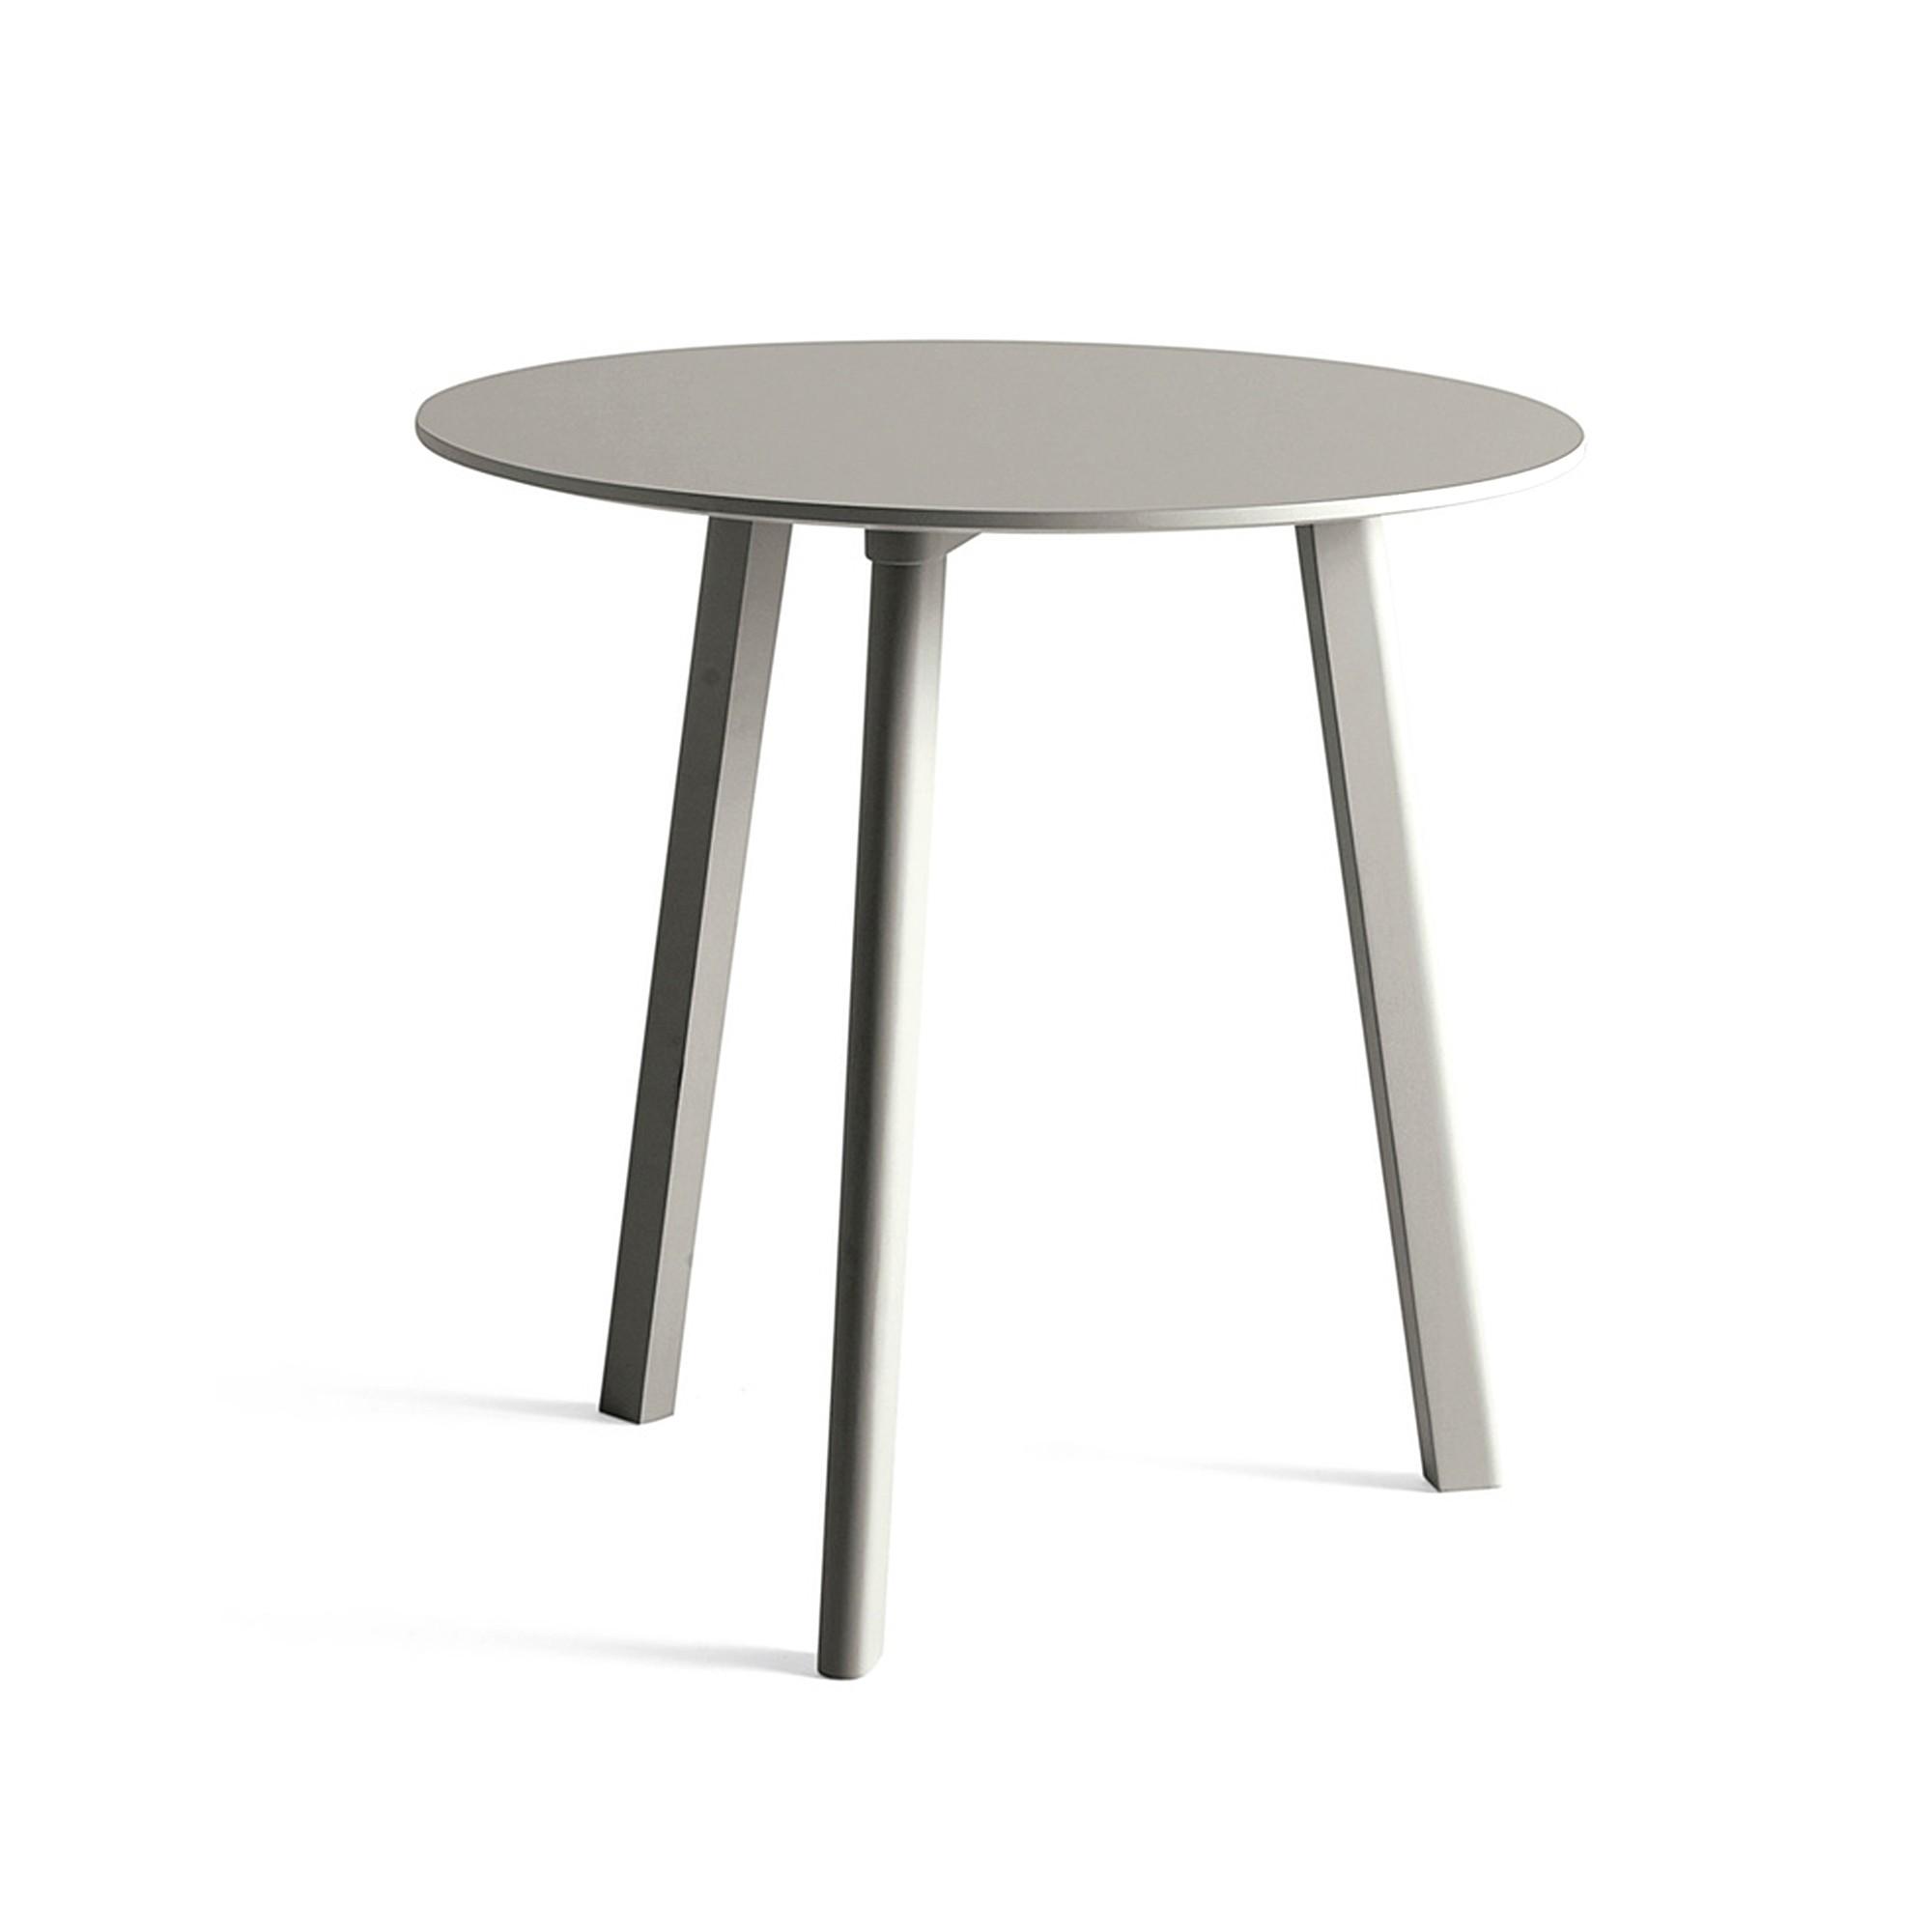 COPENHAGEN 220 table dusty grey HAY